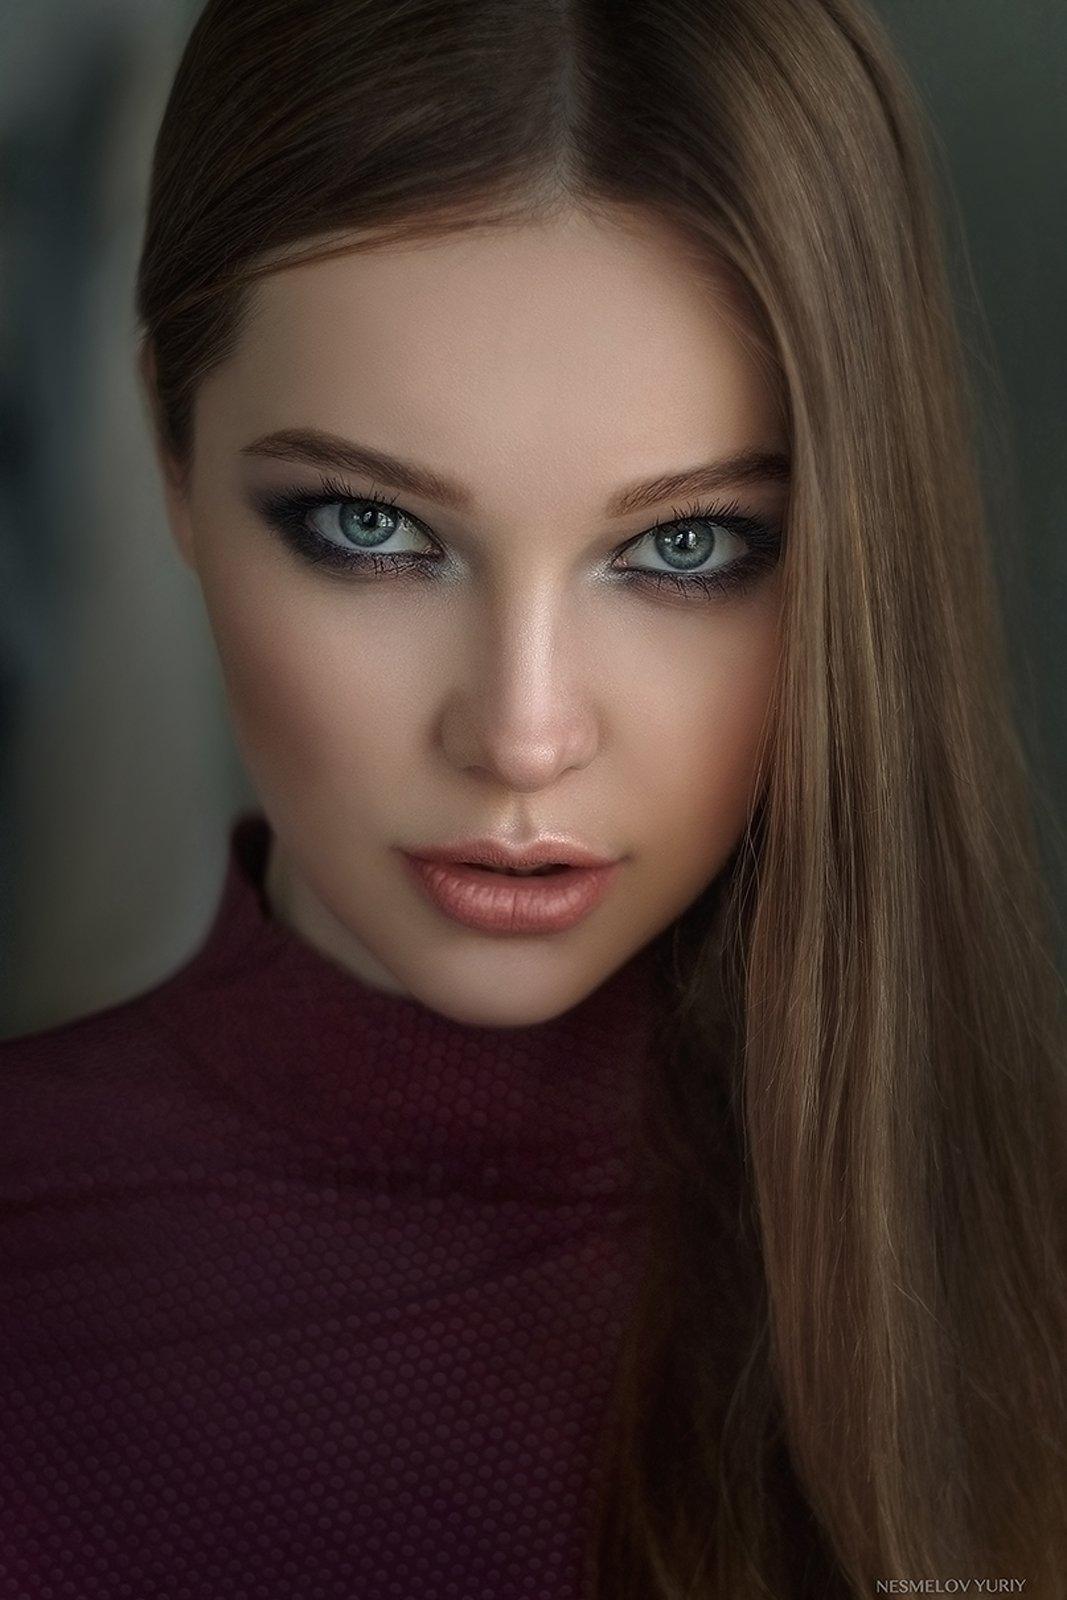 portrait, girl, art, model, девушка, портрет, Несмелов Юрий